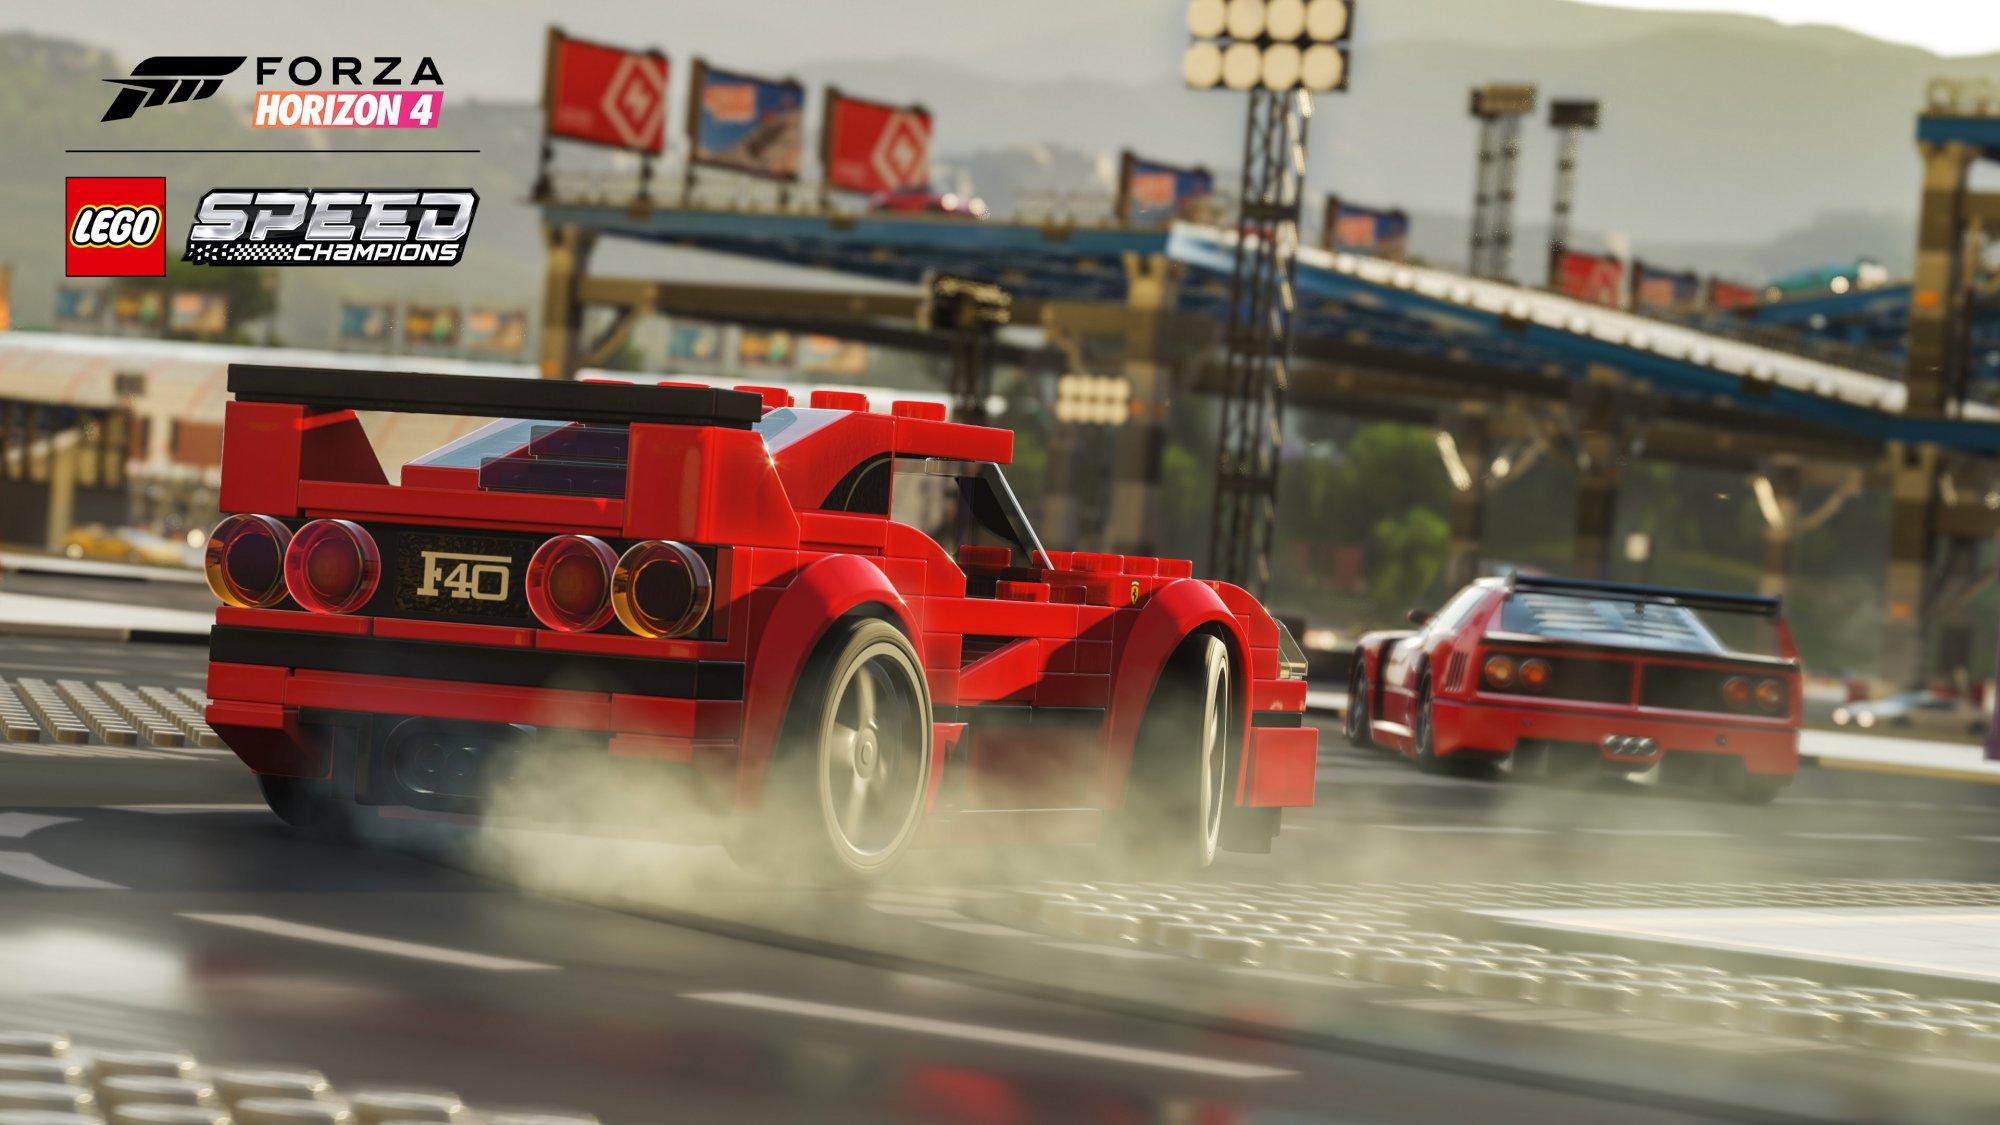 Forza Horizon 4: LEGO Speed Champions - Playground Games